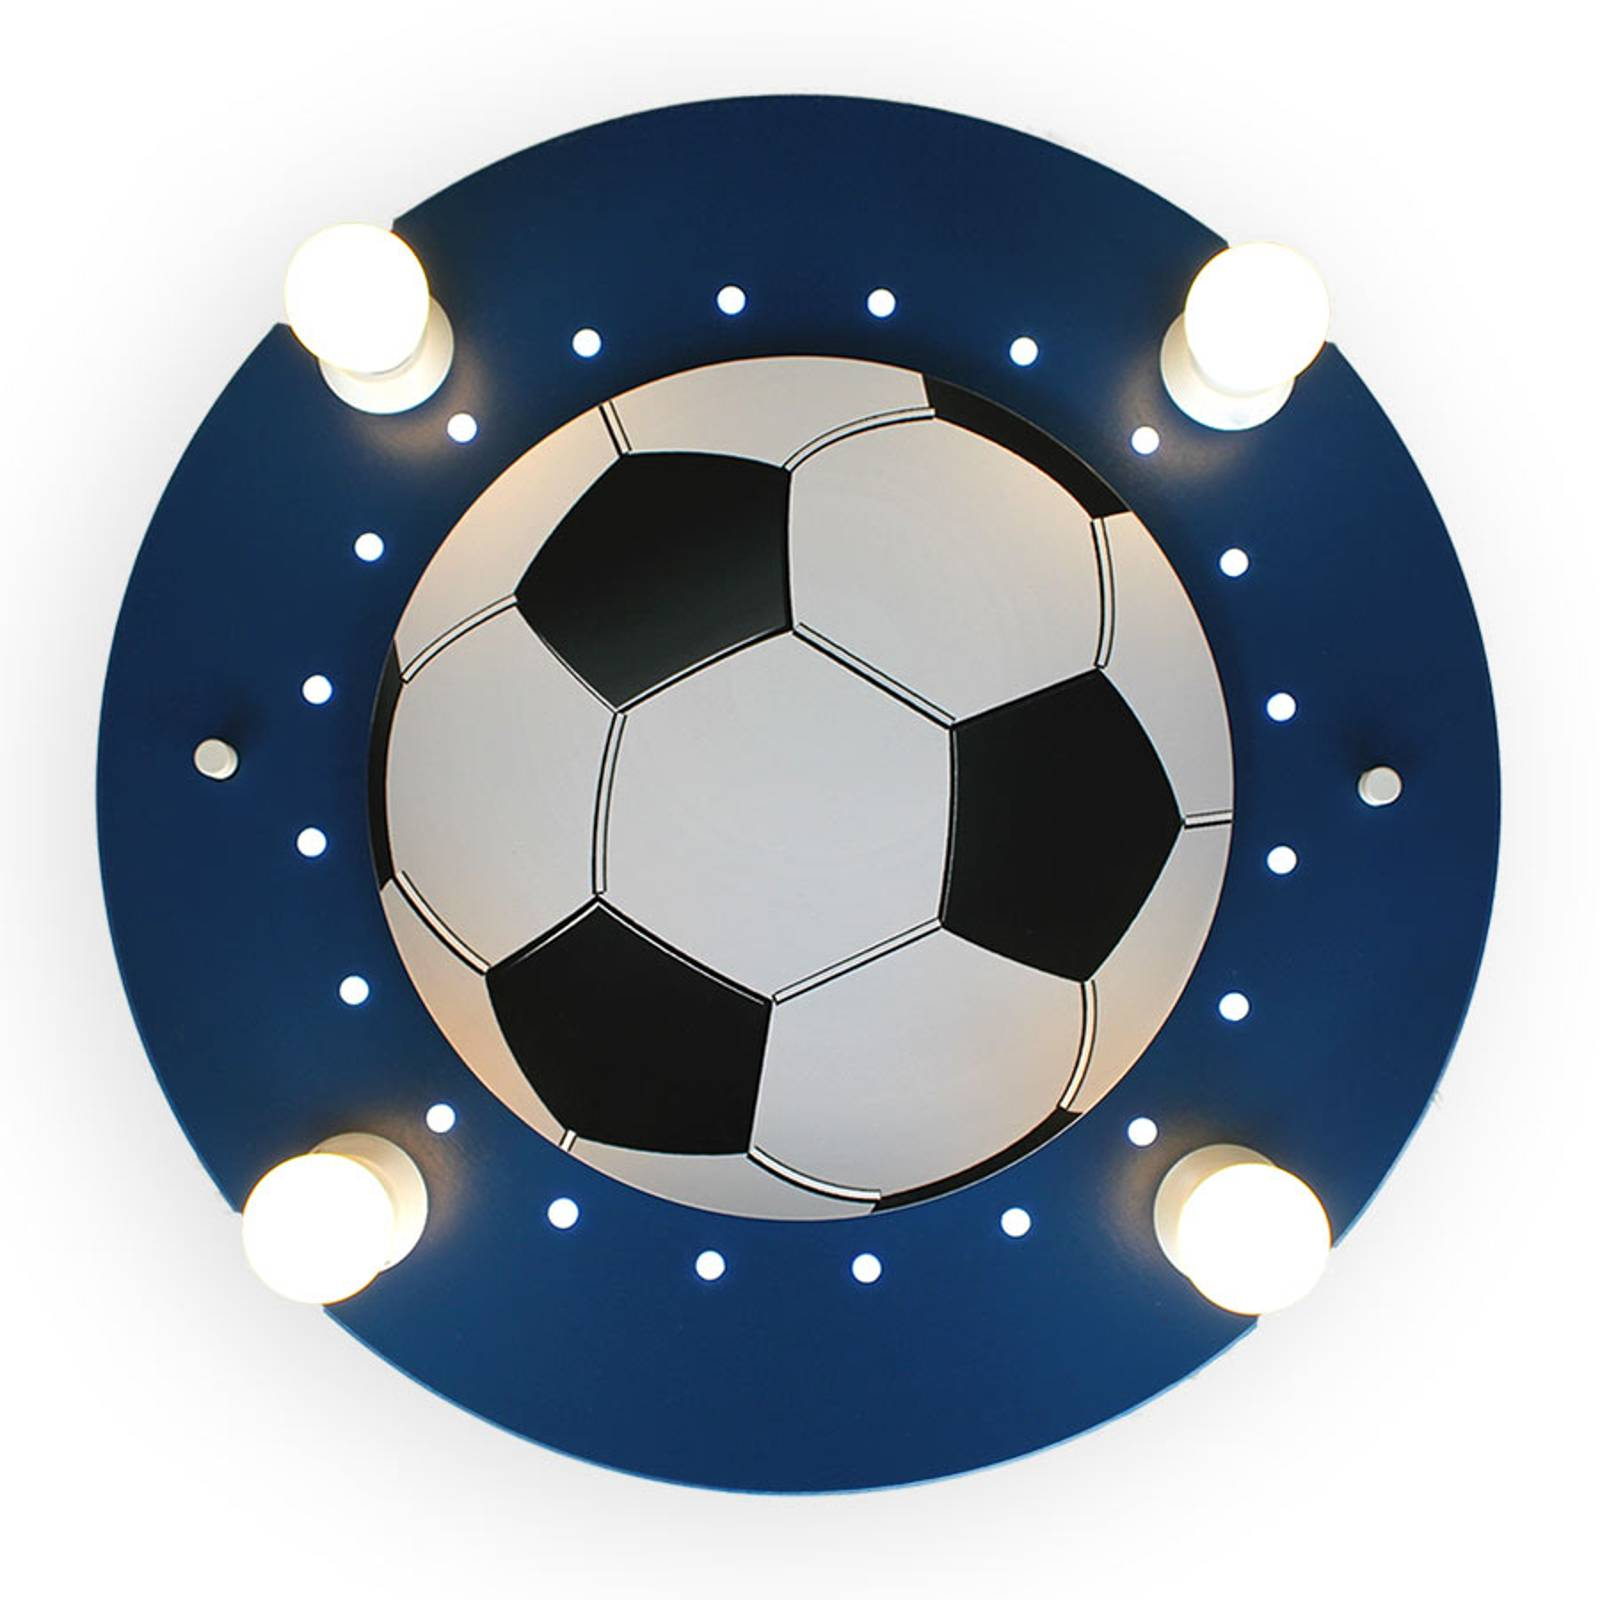 Plafondlamp Voetbal, 4-lamps donkerblauw-wit